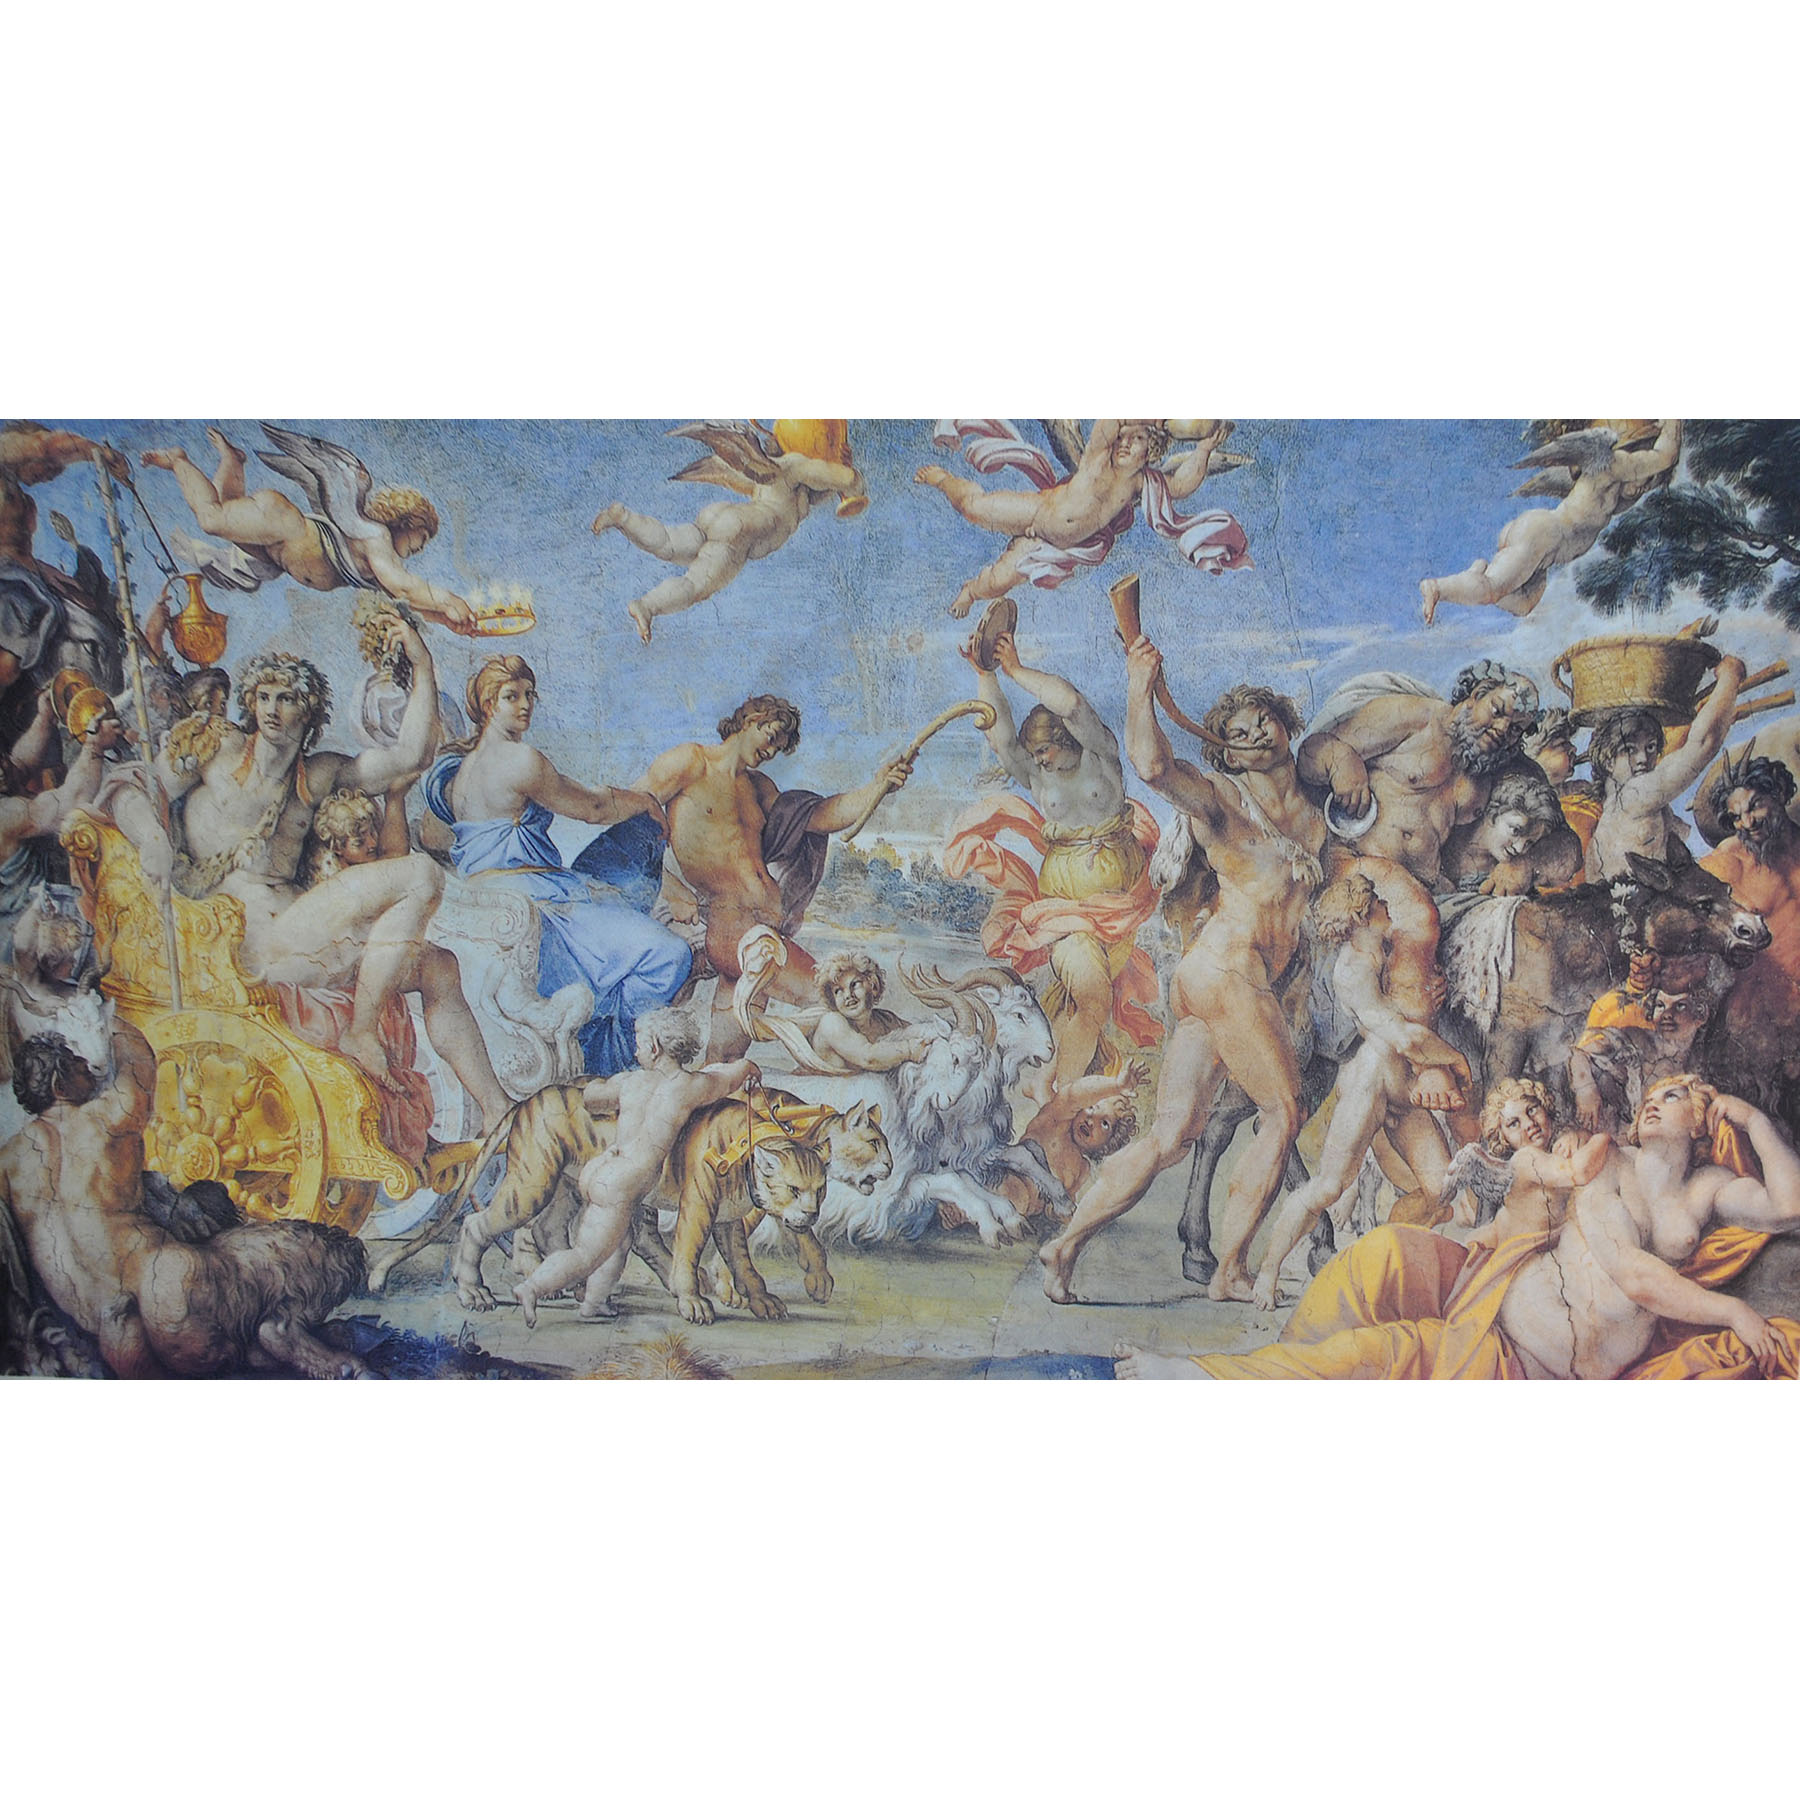 Maler Panneaux 151,5 x 71,5 cm -  Deckenmalerei Renaissance